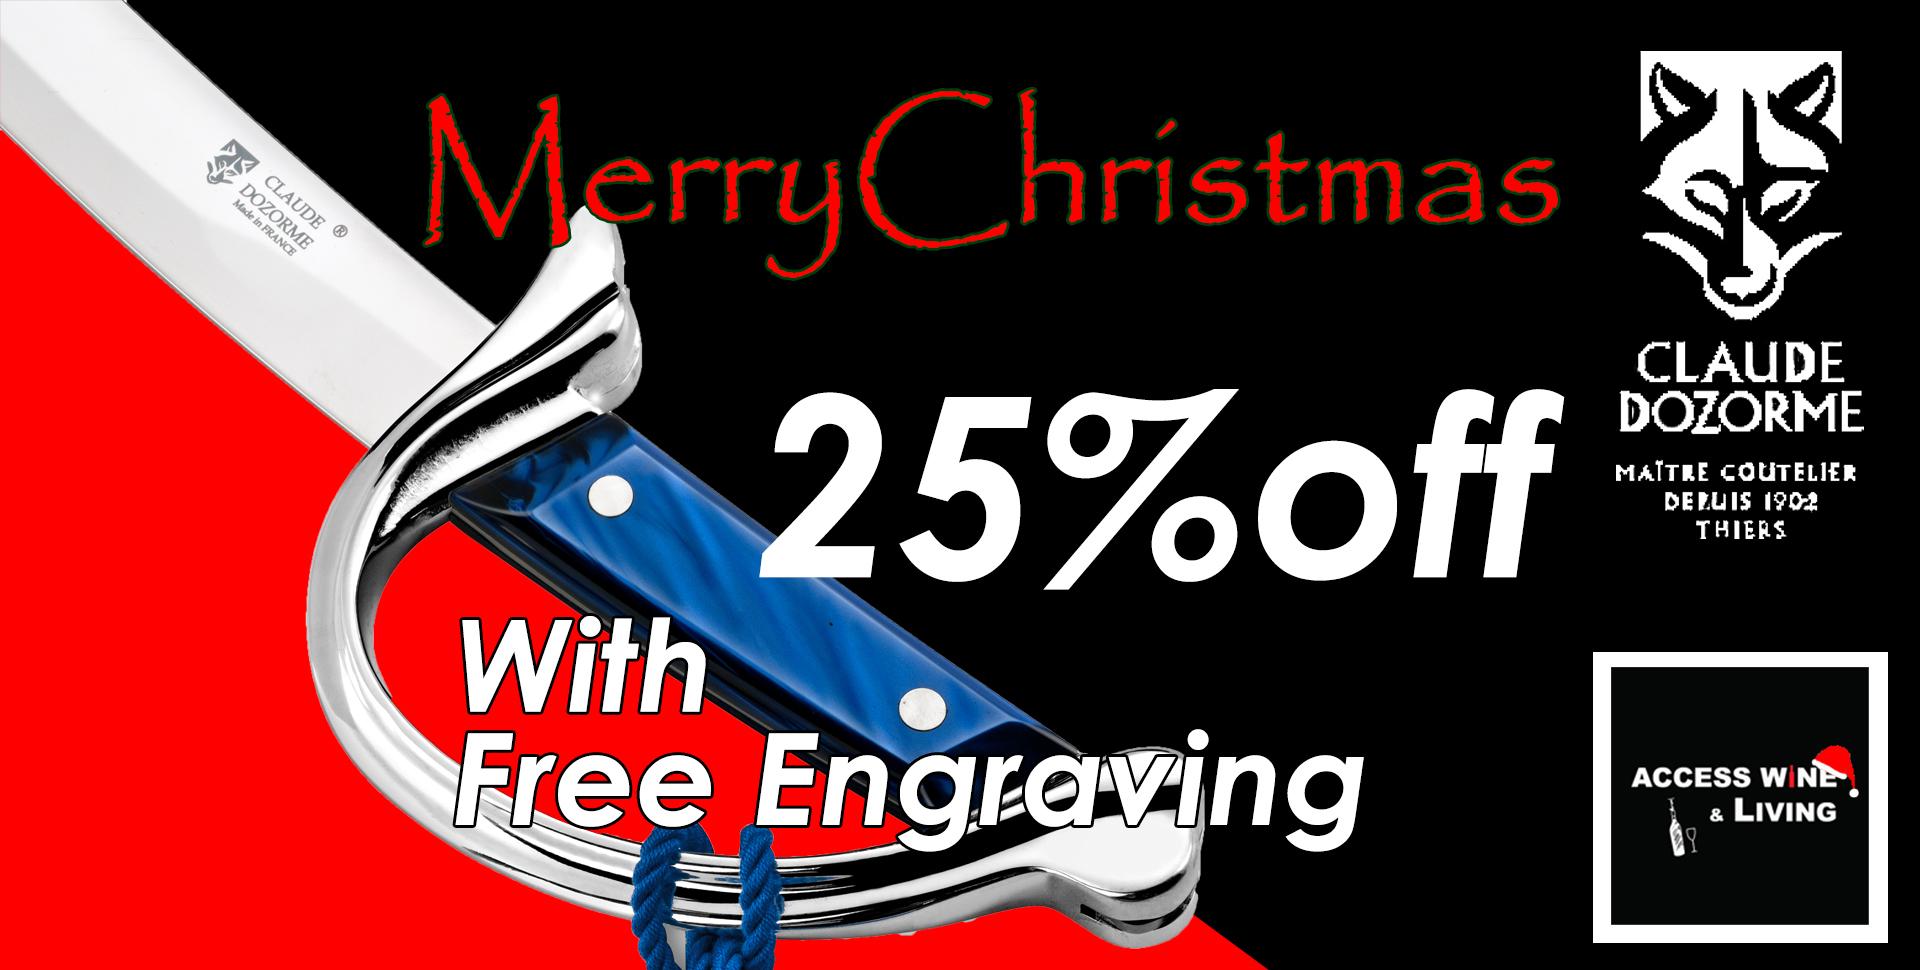 france, 香檳刀, 耶誕節, 聖誕節, merry, christmas, gift, 禮盒, 手工, 高級, highclass, 酒器, wine, accessories, 原裝